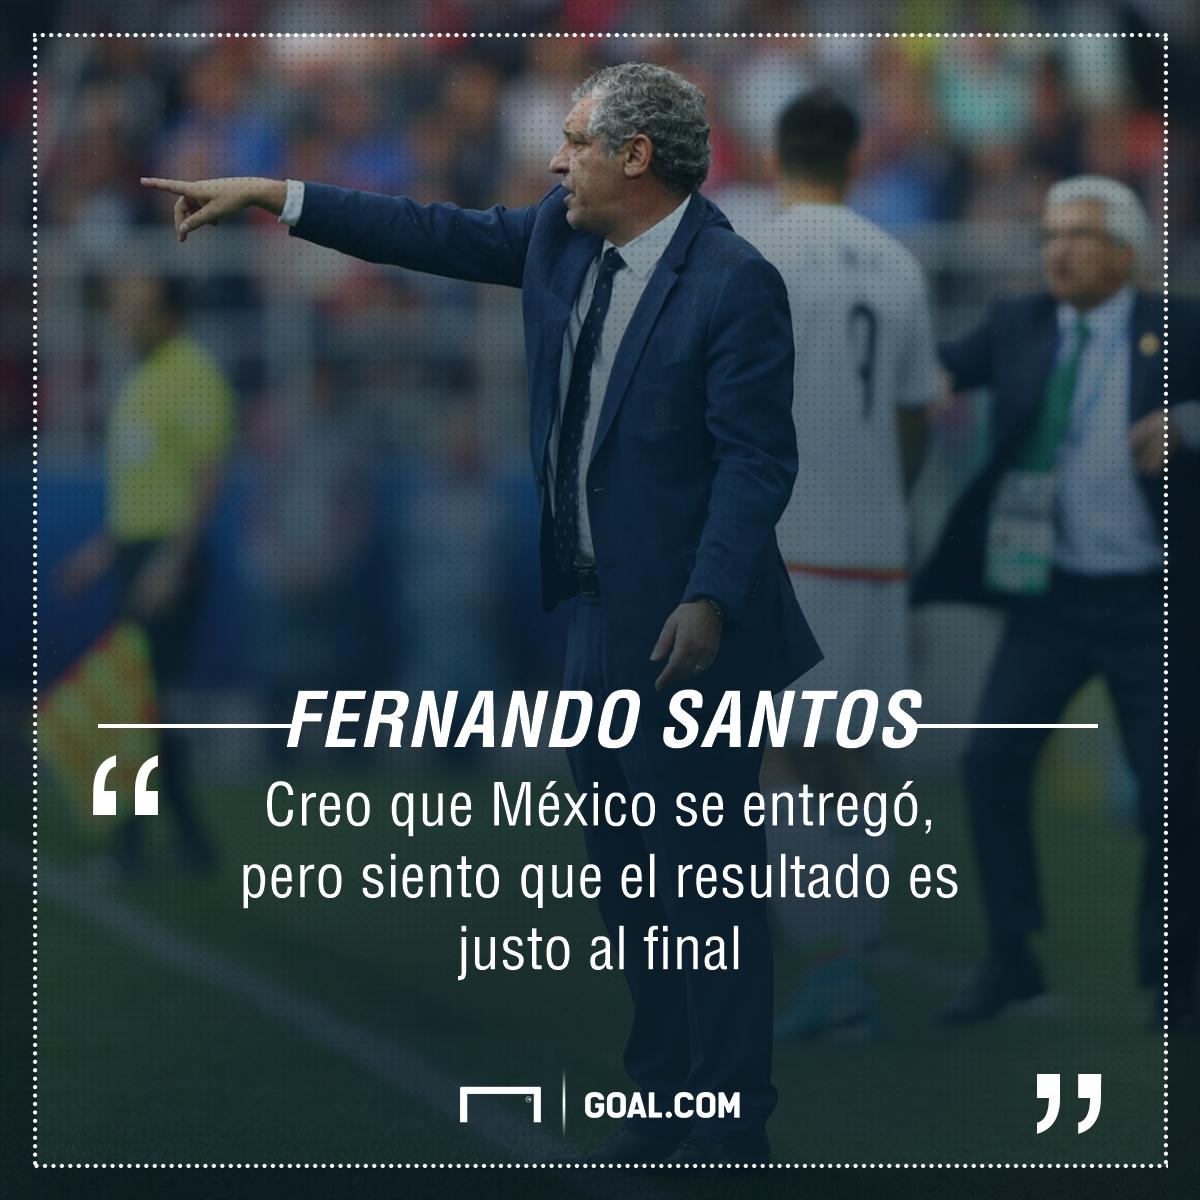 Fernando Santos afiche